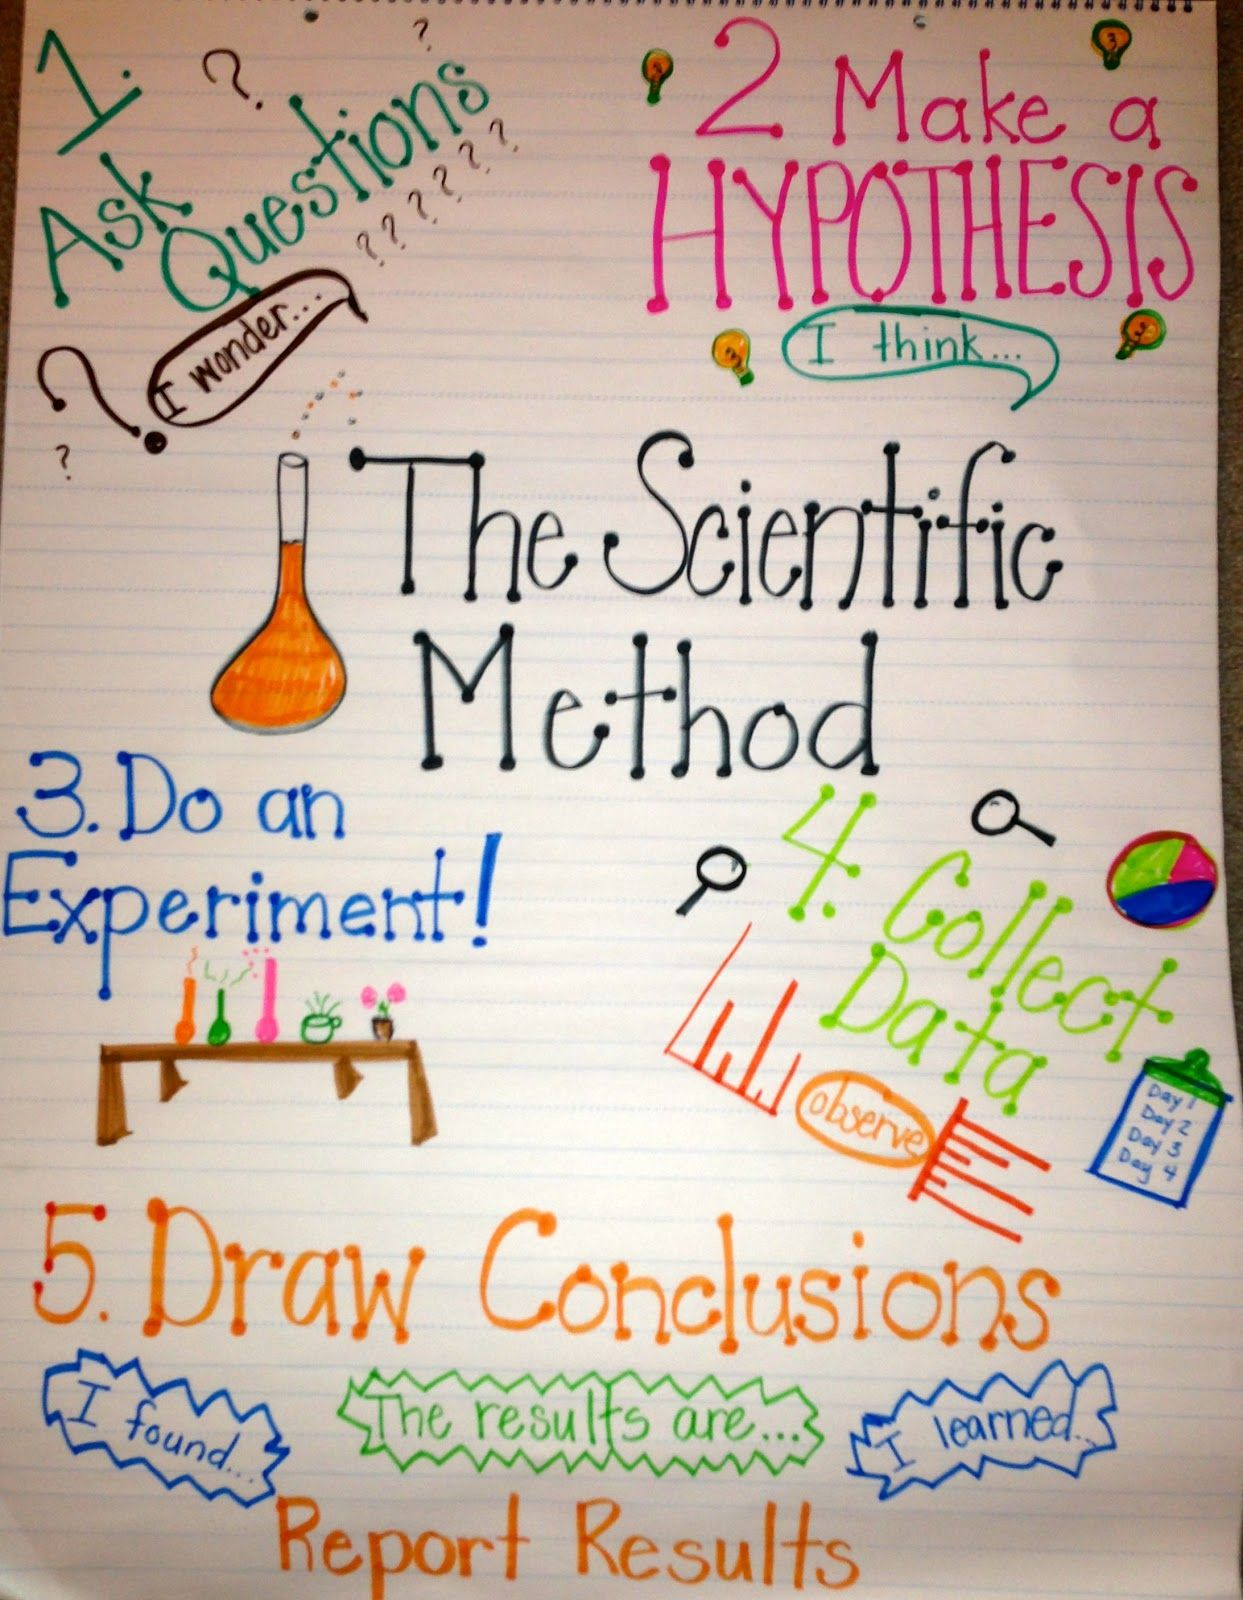 Scientific Method Steps Examples & Worksheet - Zoey And